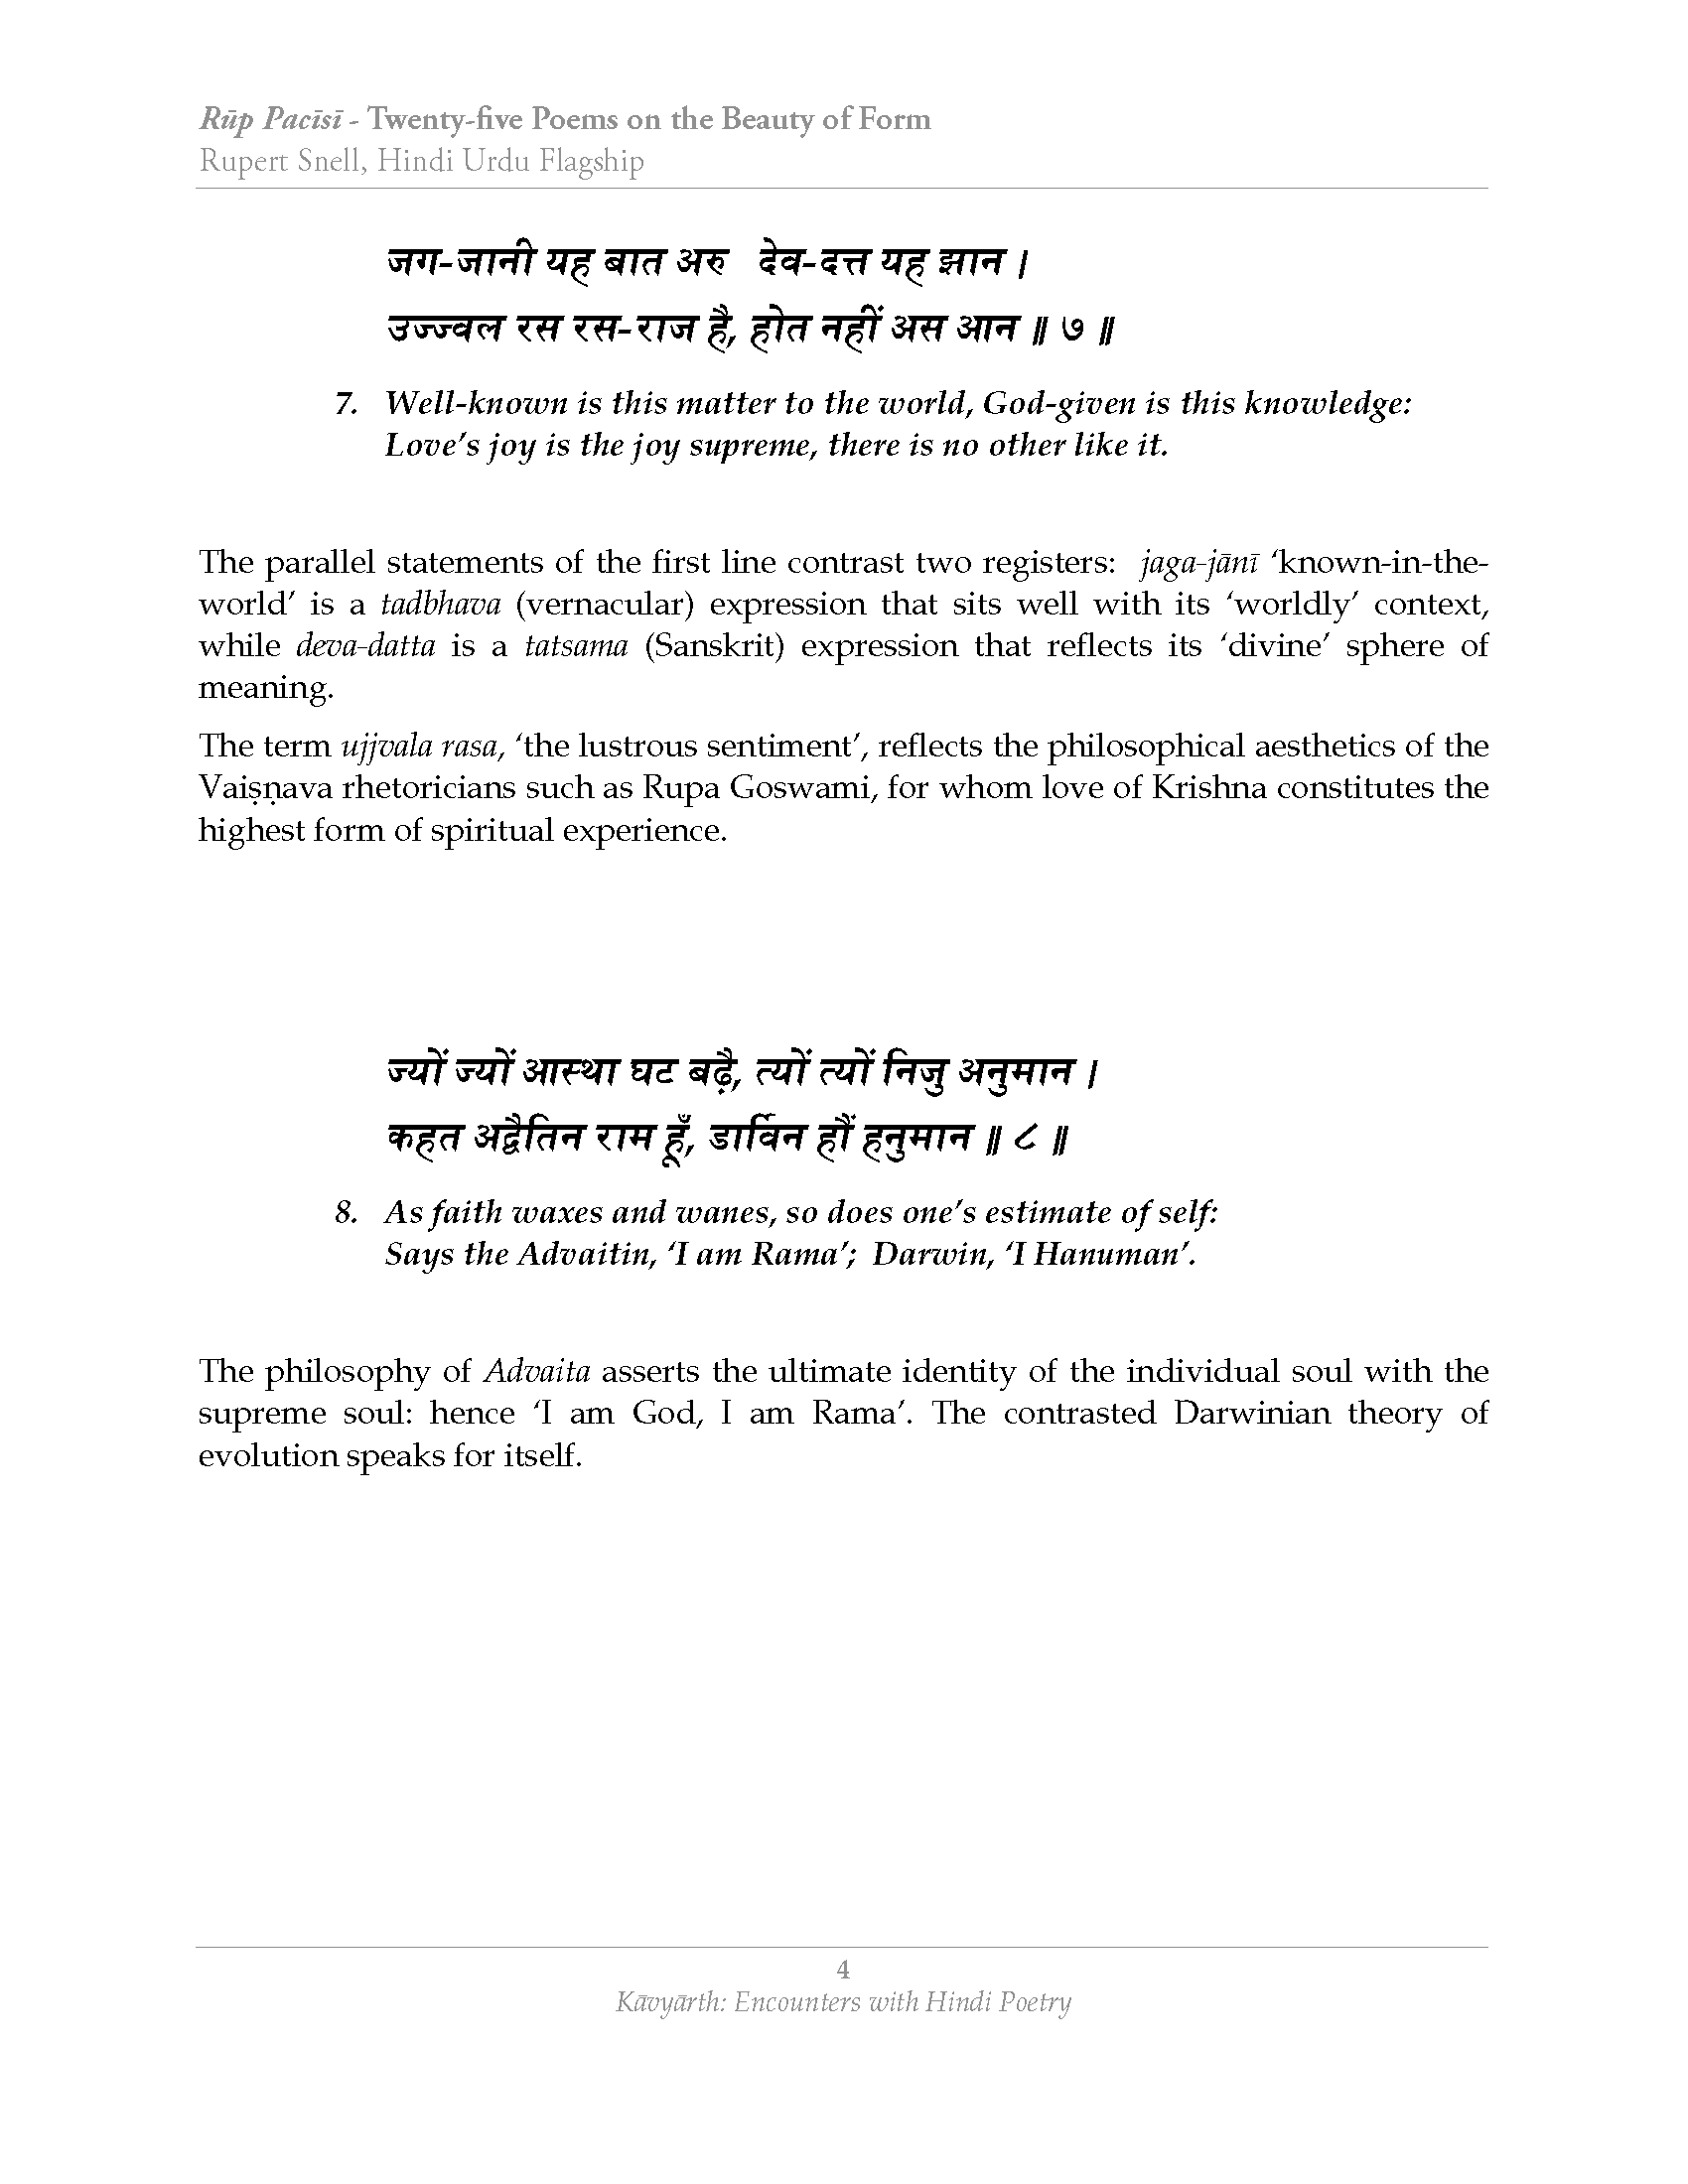 rip hindi translation